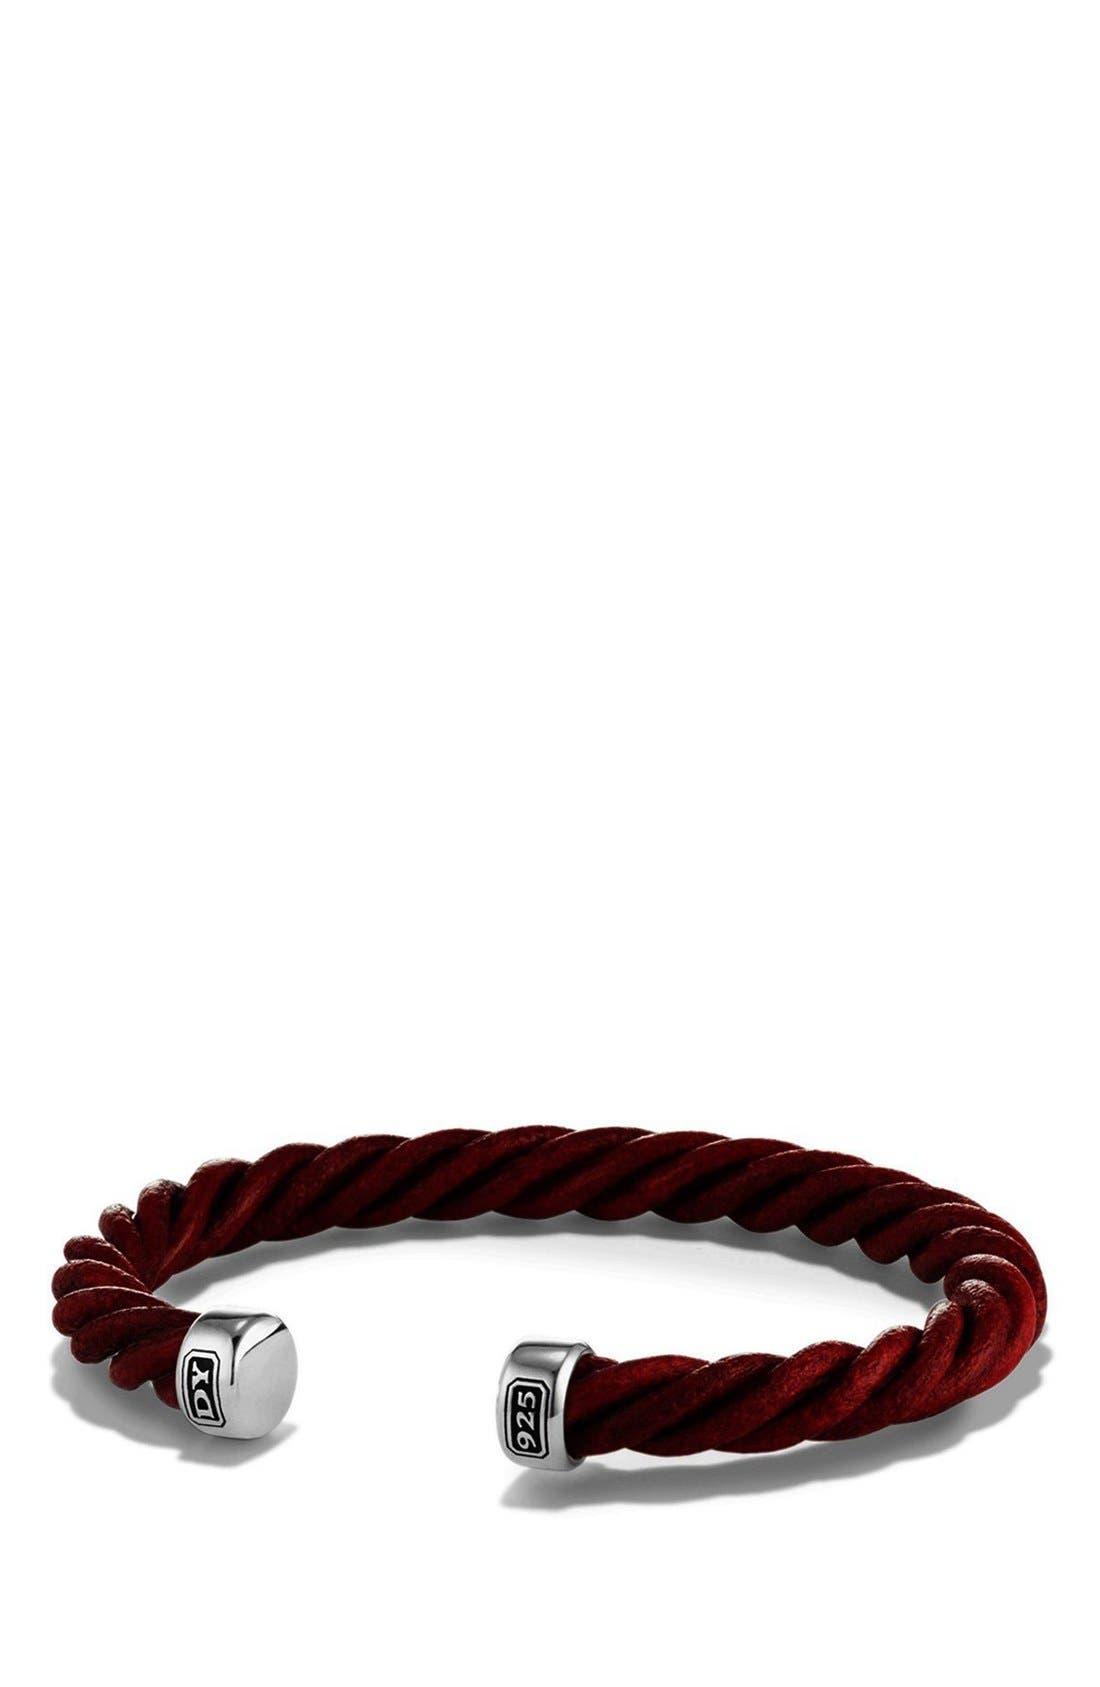 Main Image - David Yurman Leather Cuff Bracelet